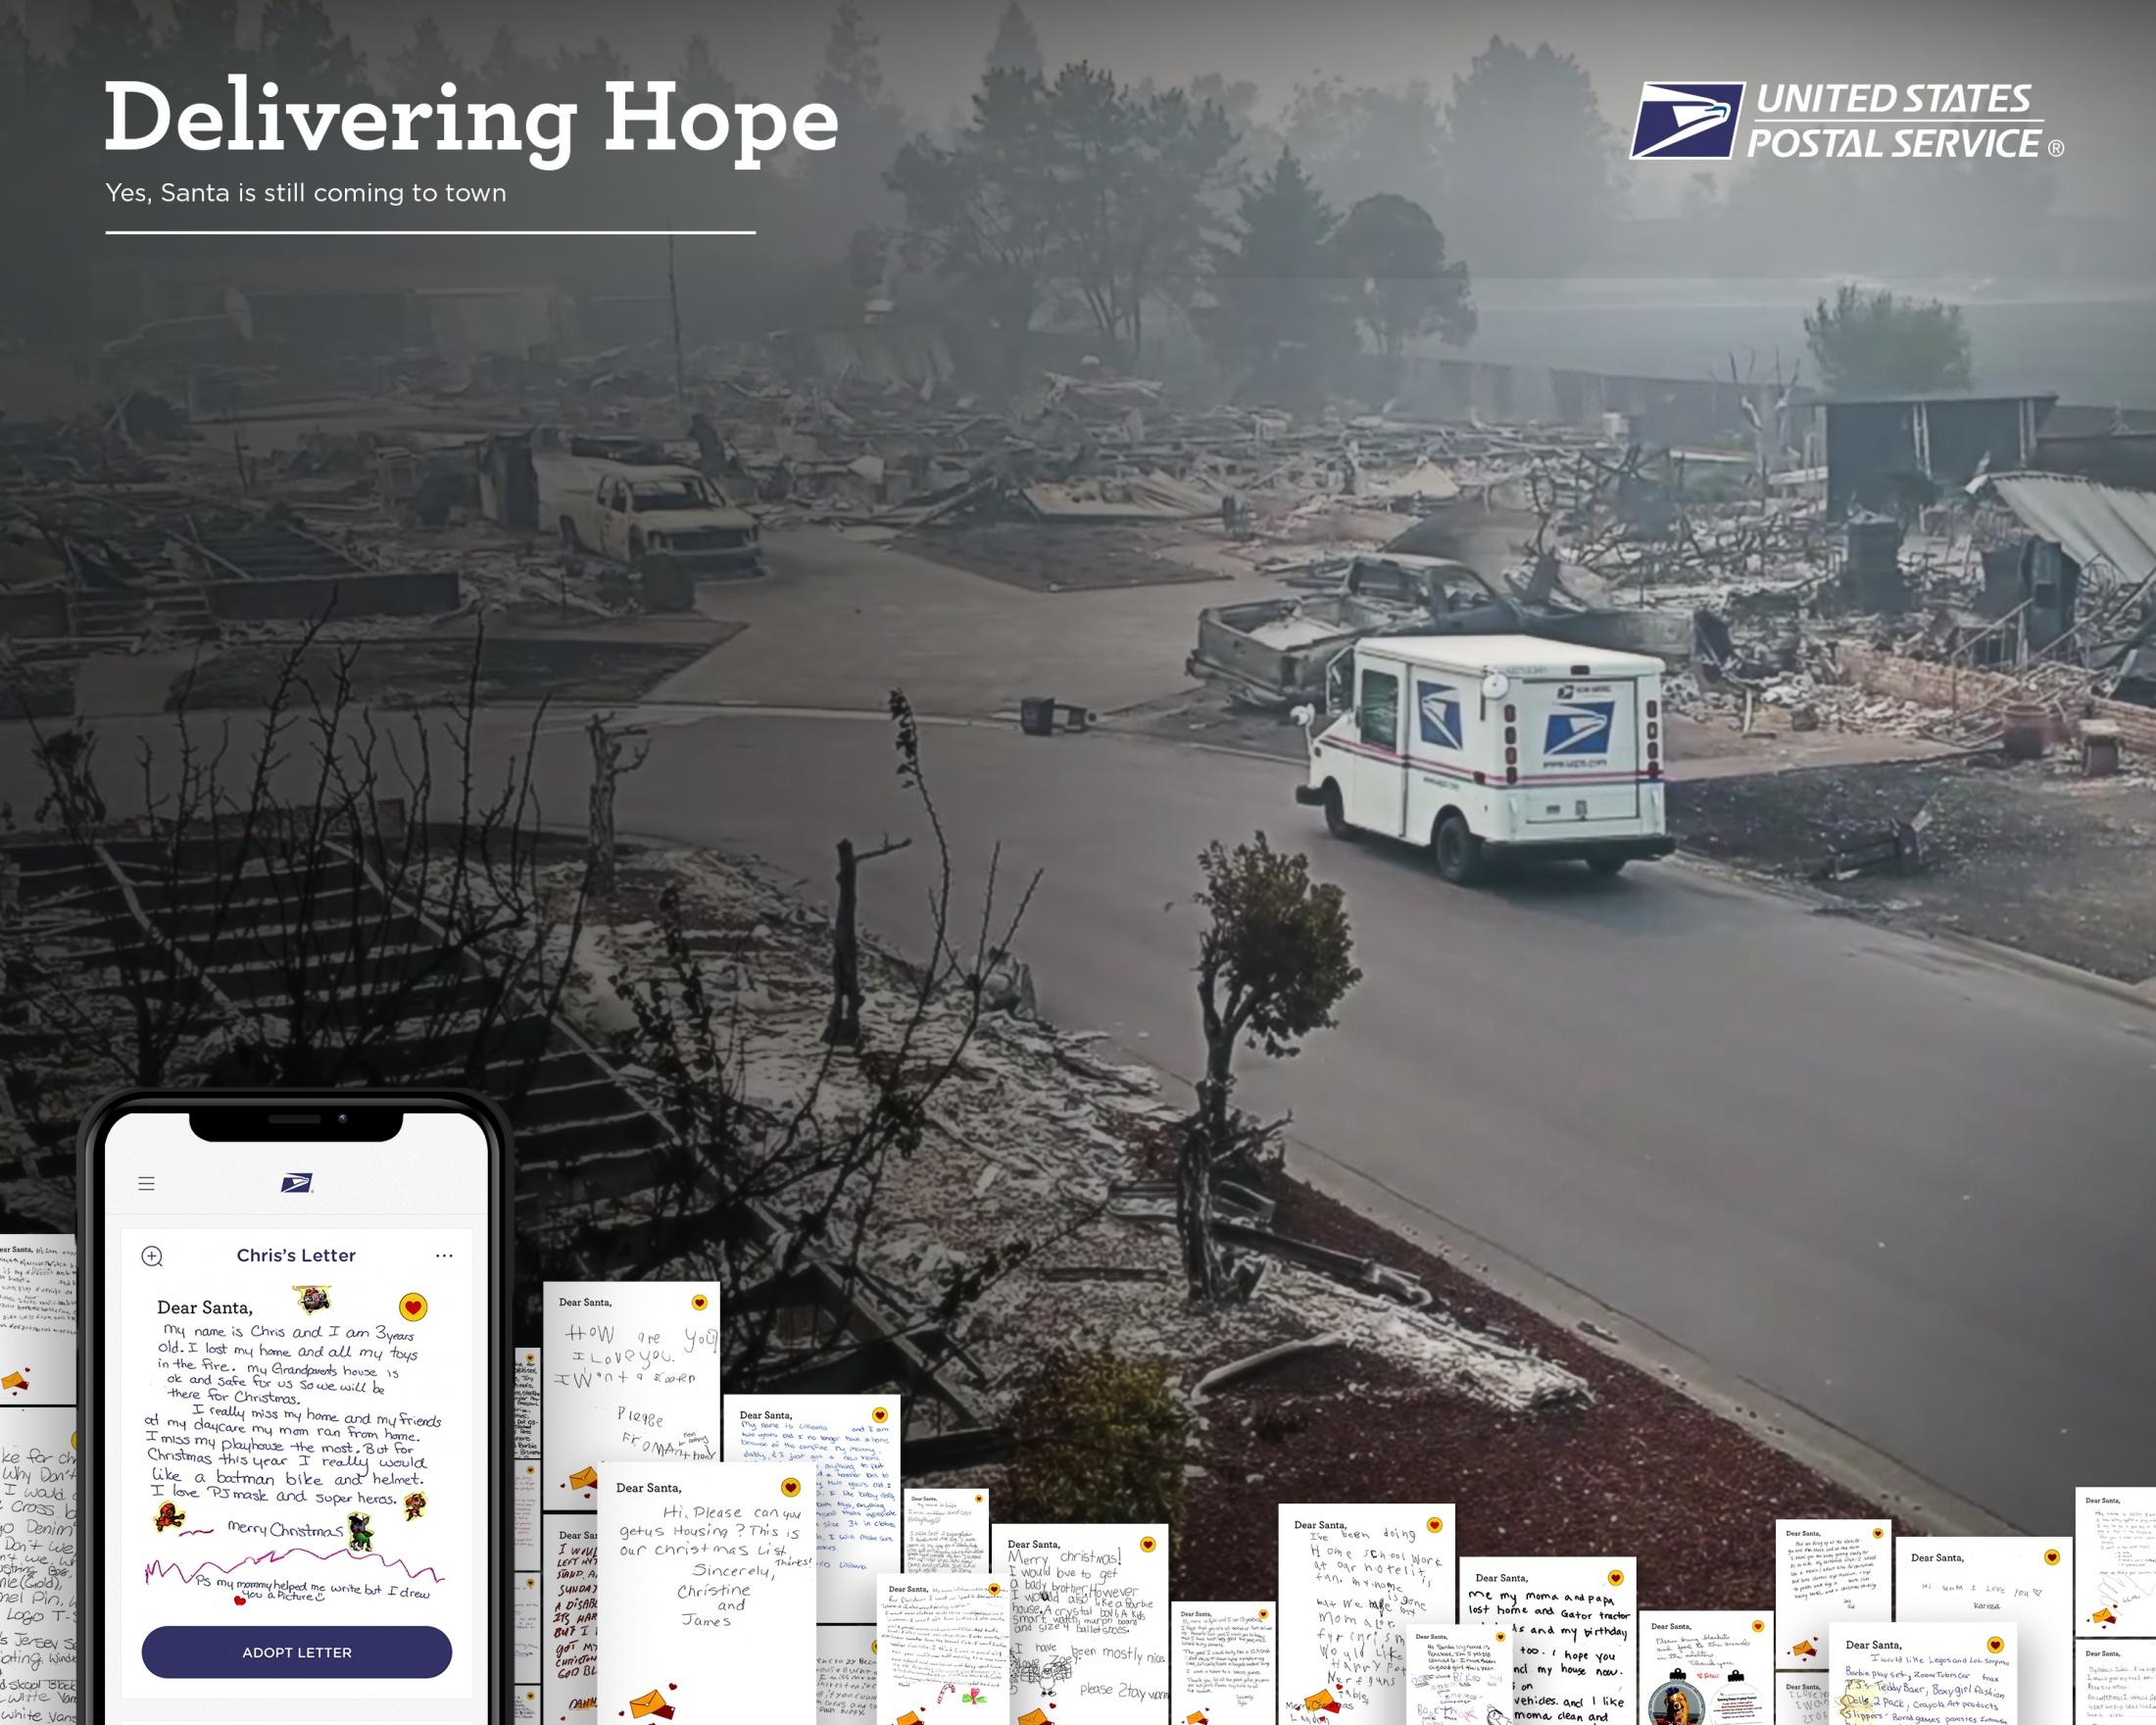 Thumbnail for Delivering Hope